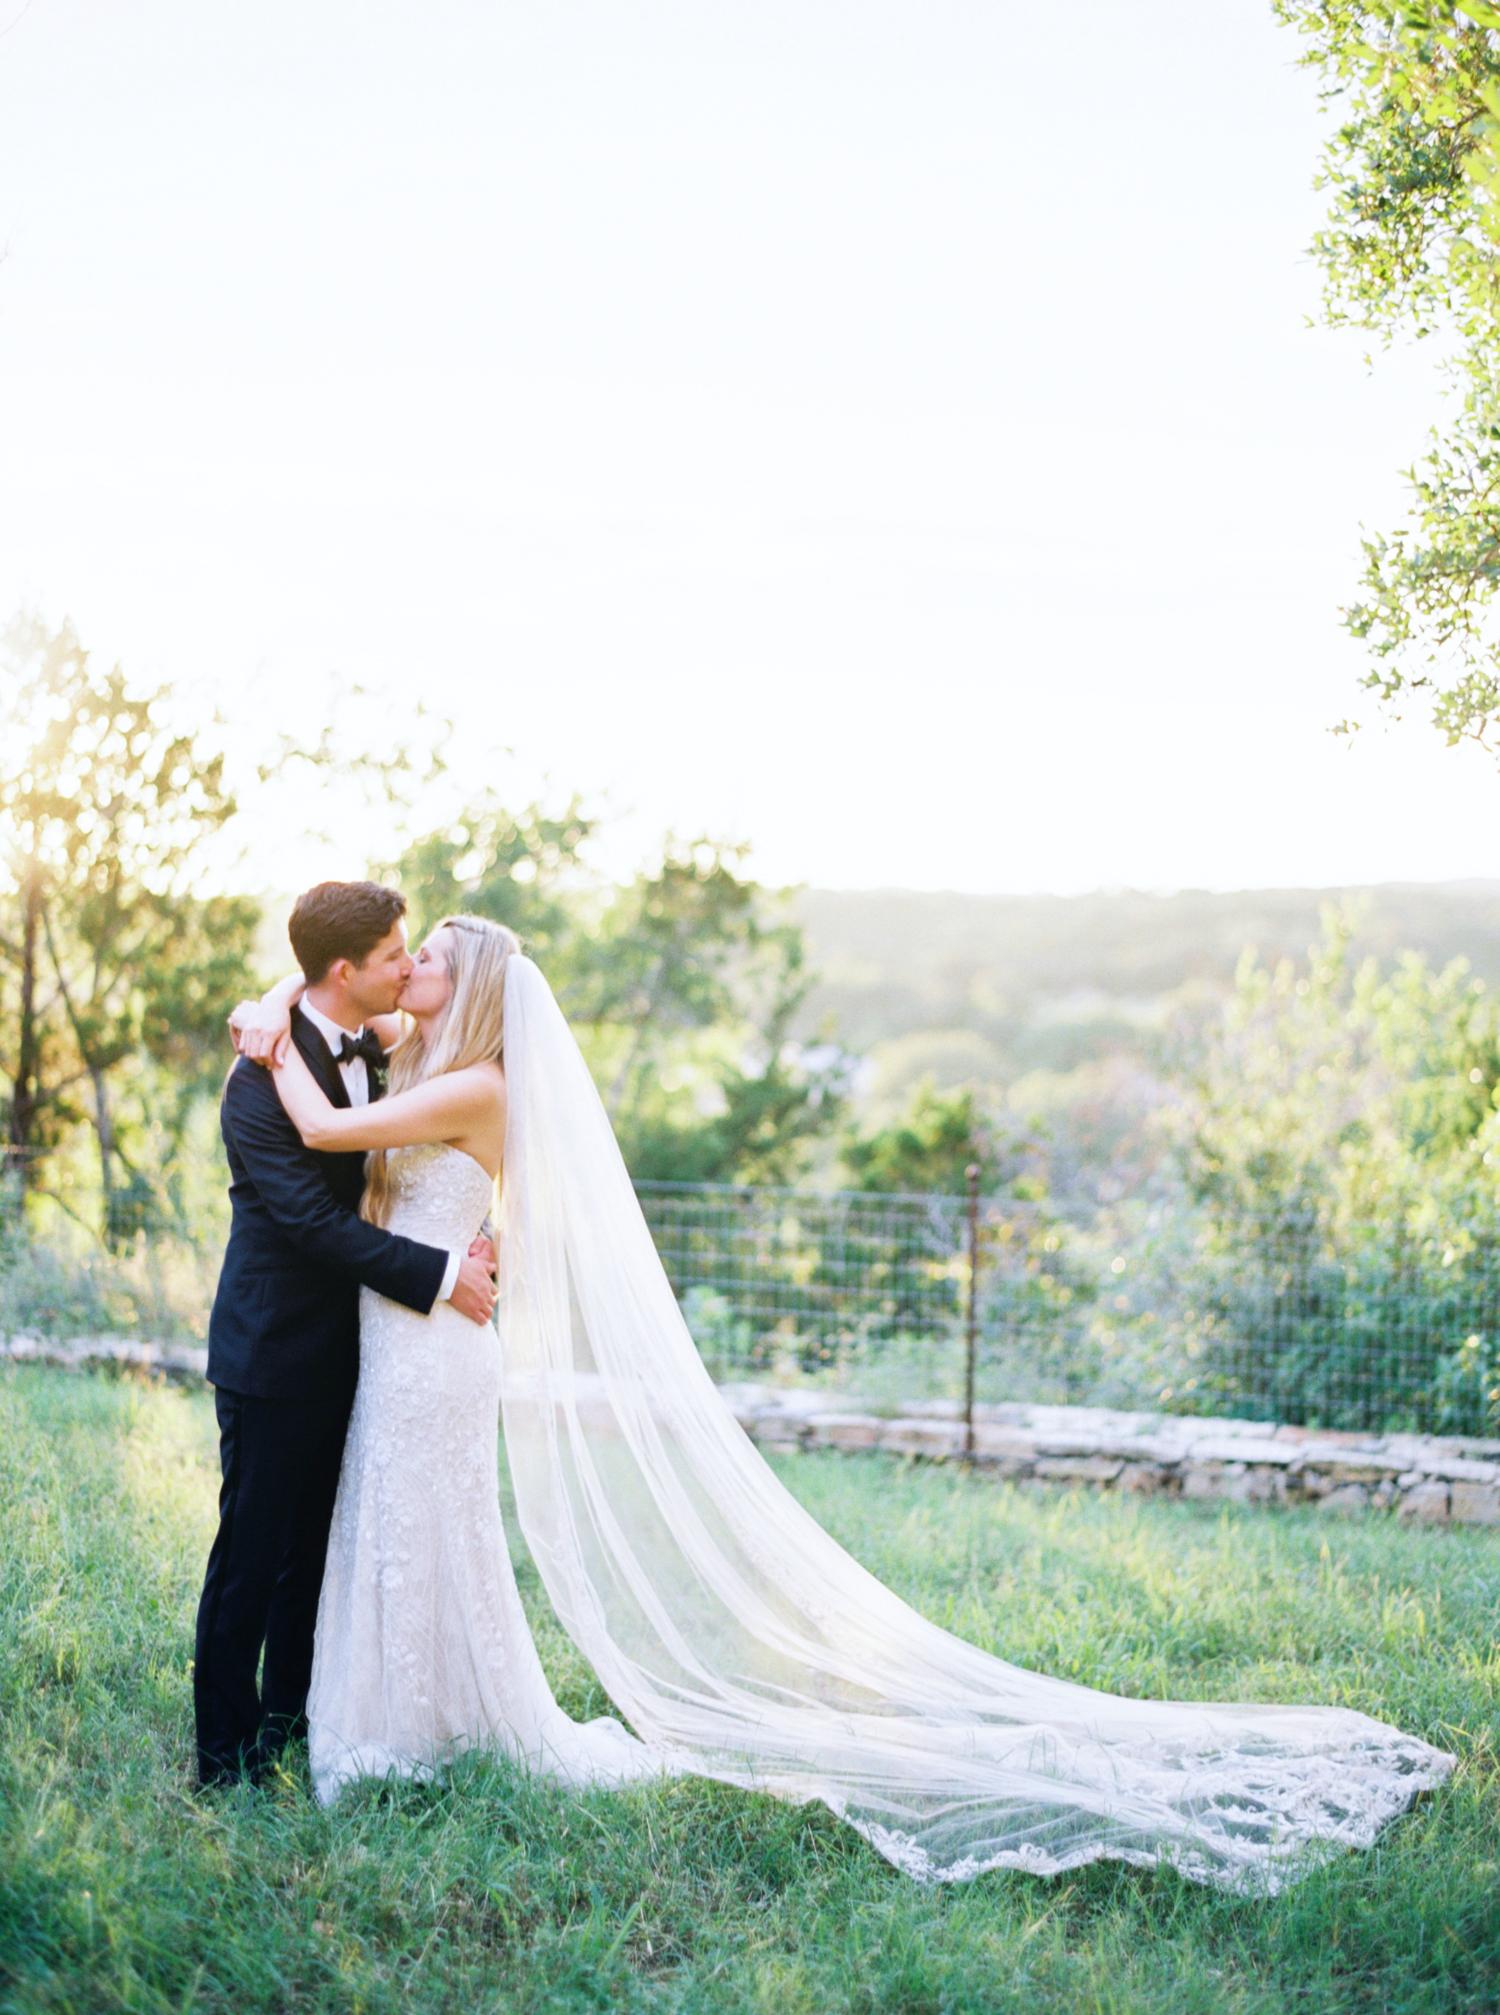 AUSTIN WEDDING PHOTOGRAPHER-58.jpg